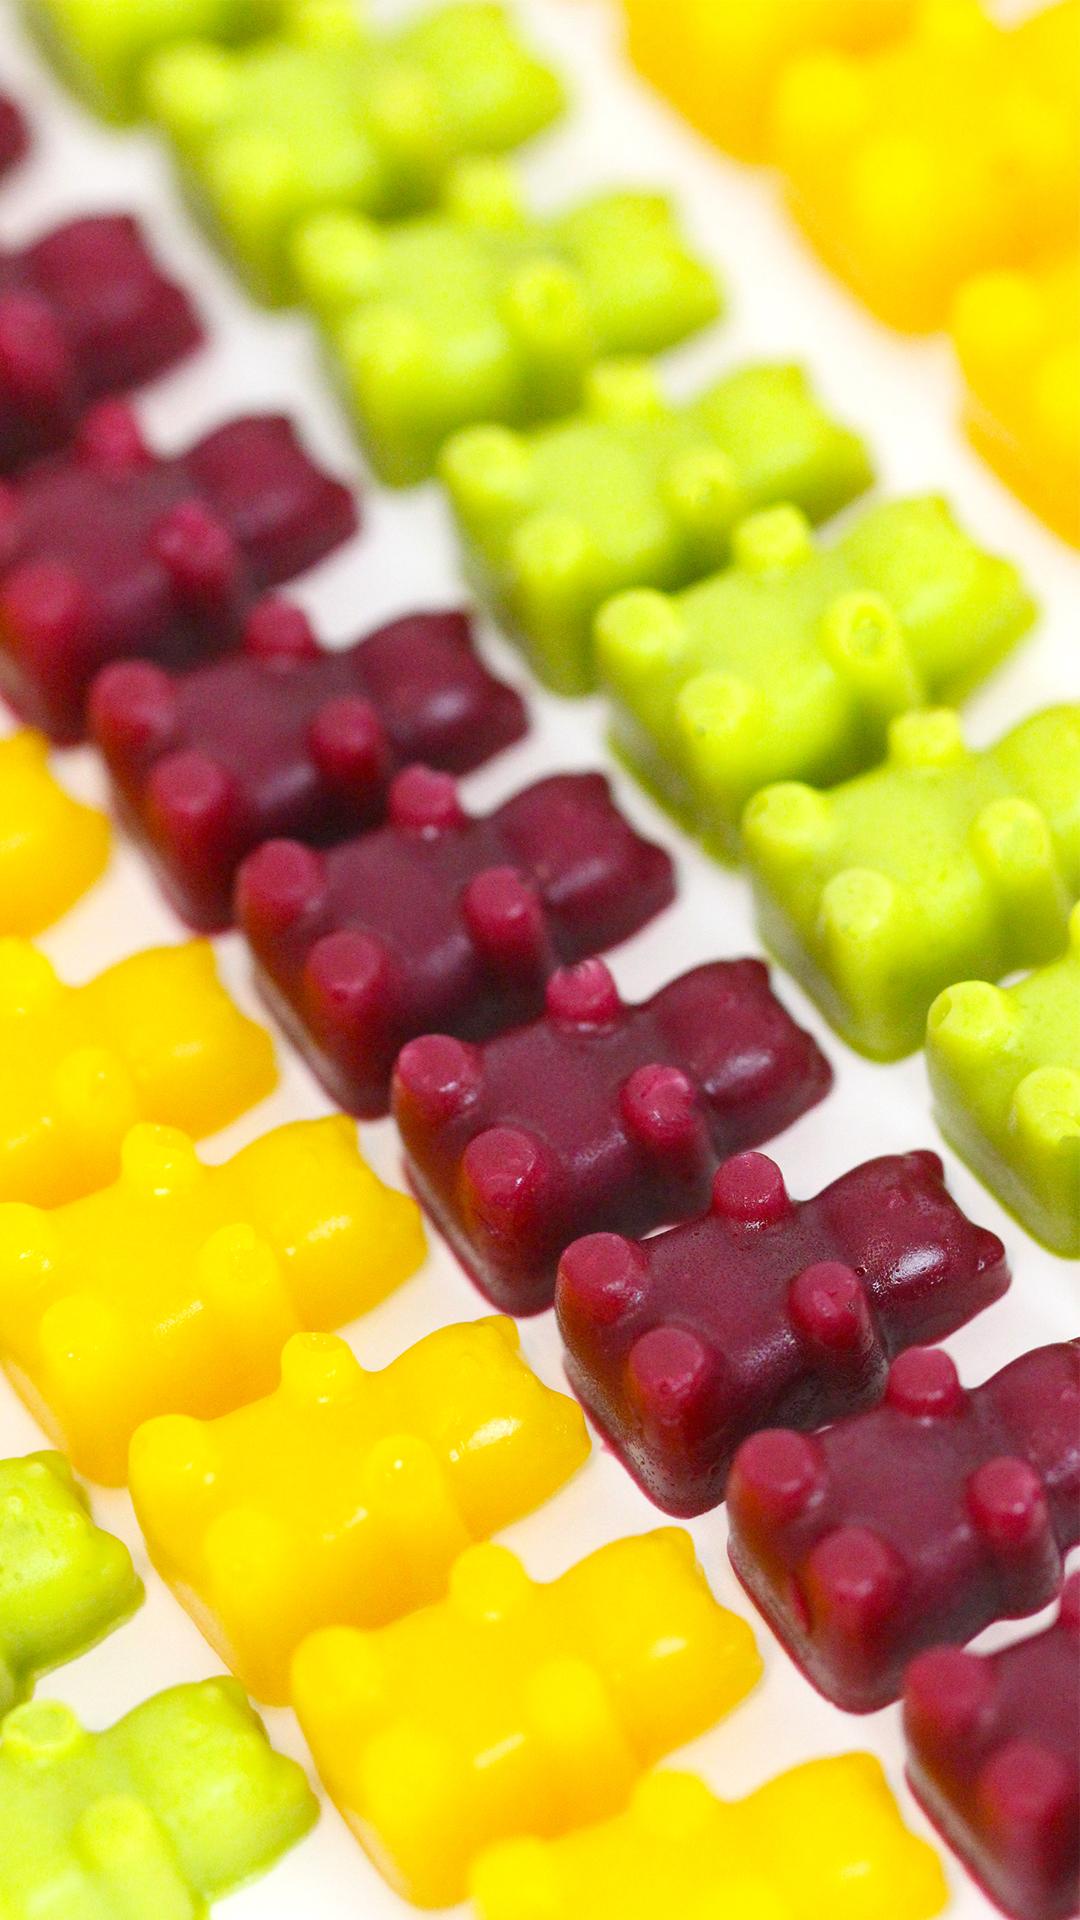 Vegan Gummy Bears Video Recipe Video Vegan Gummies Vegan Gummy Bears Gummies Recipe